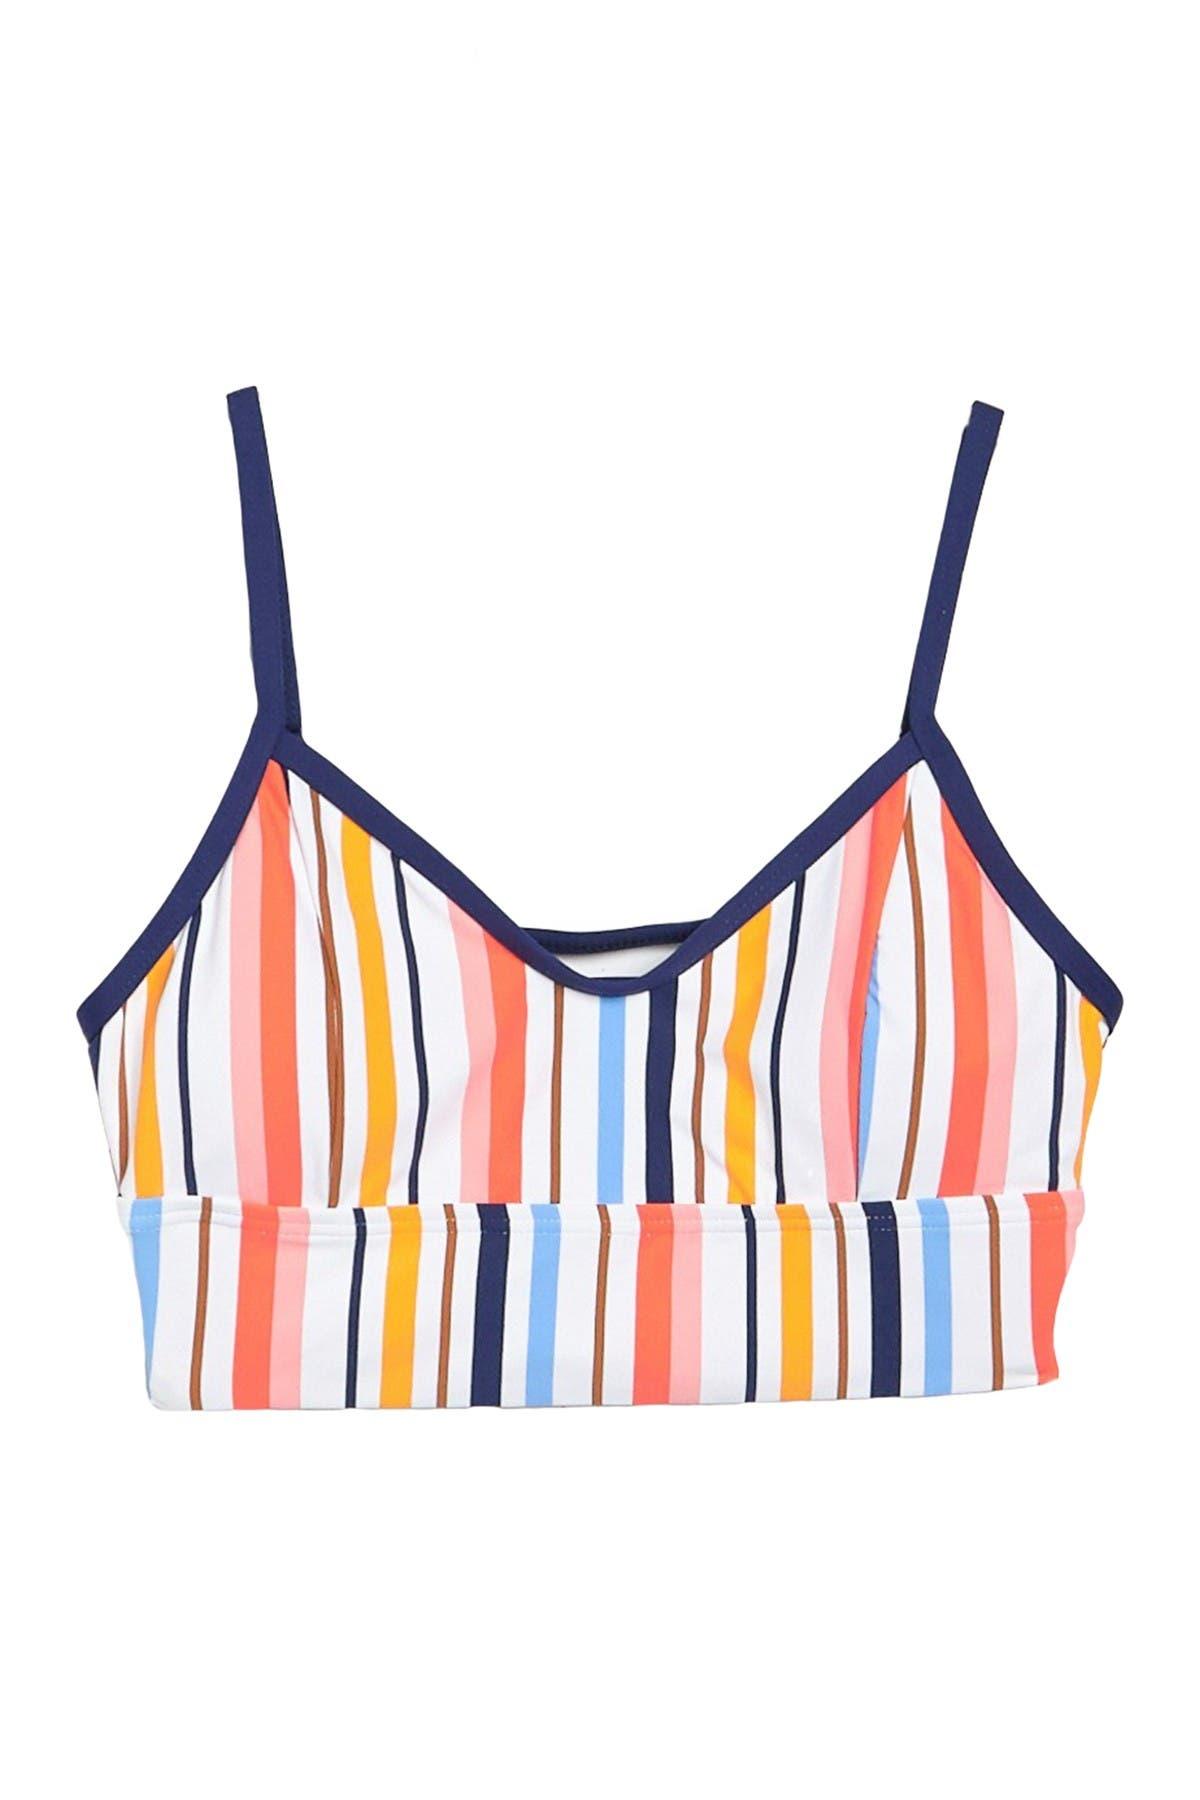 Image of NEXT Sunset Longline Bikini Top